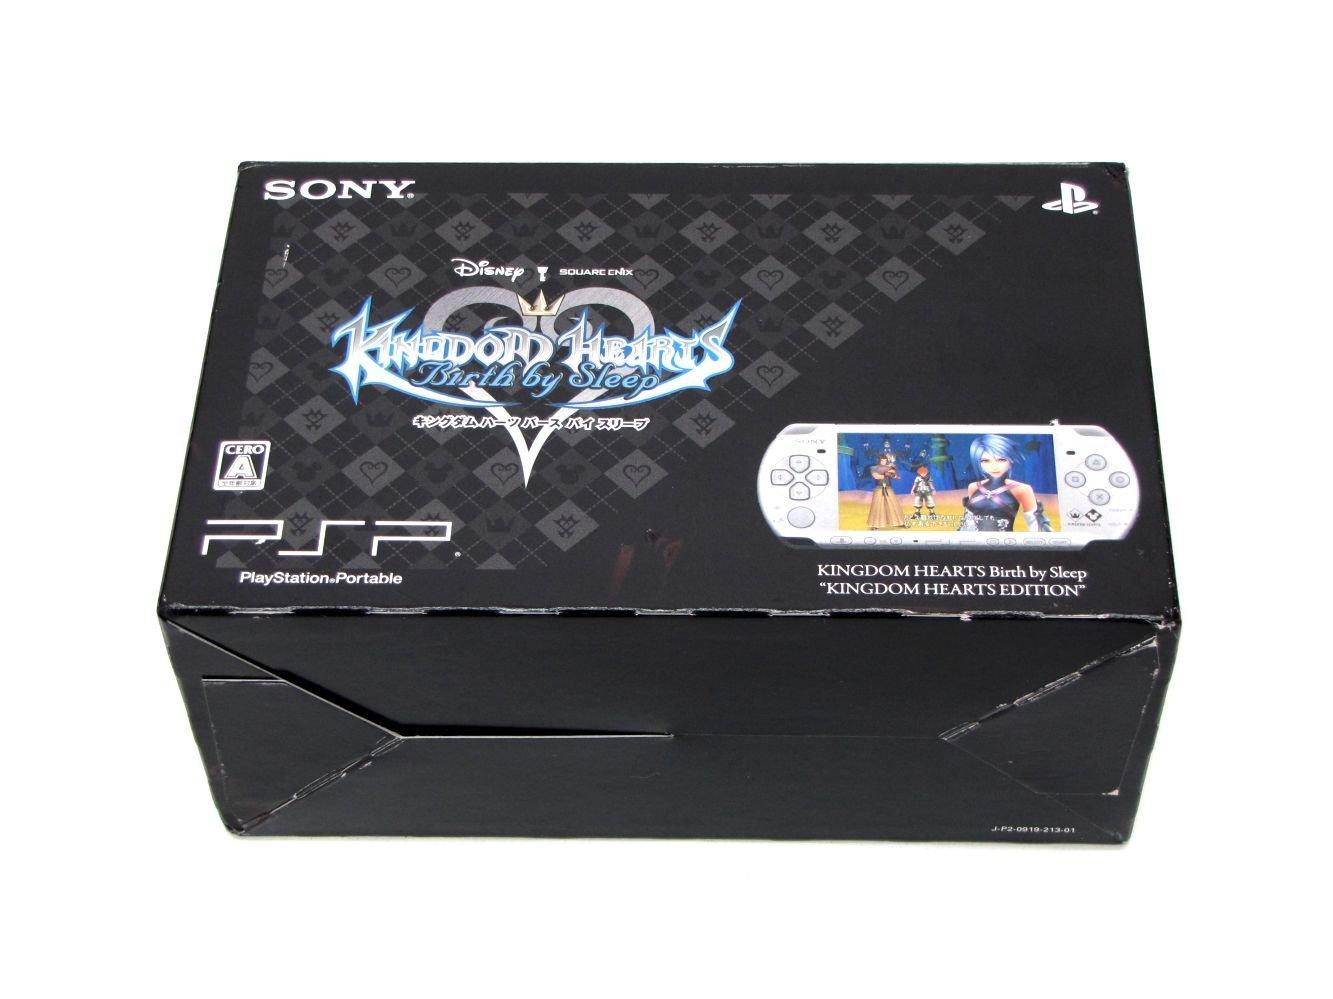 PSP「プレイステーションポータブル」 KINGDOM HEARTS Birth by Sleep『KINGDOM HEARTS EDITION』 (PSPJ-30012) 【メーカー生産終了】 B002XISAOU